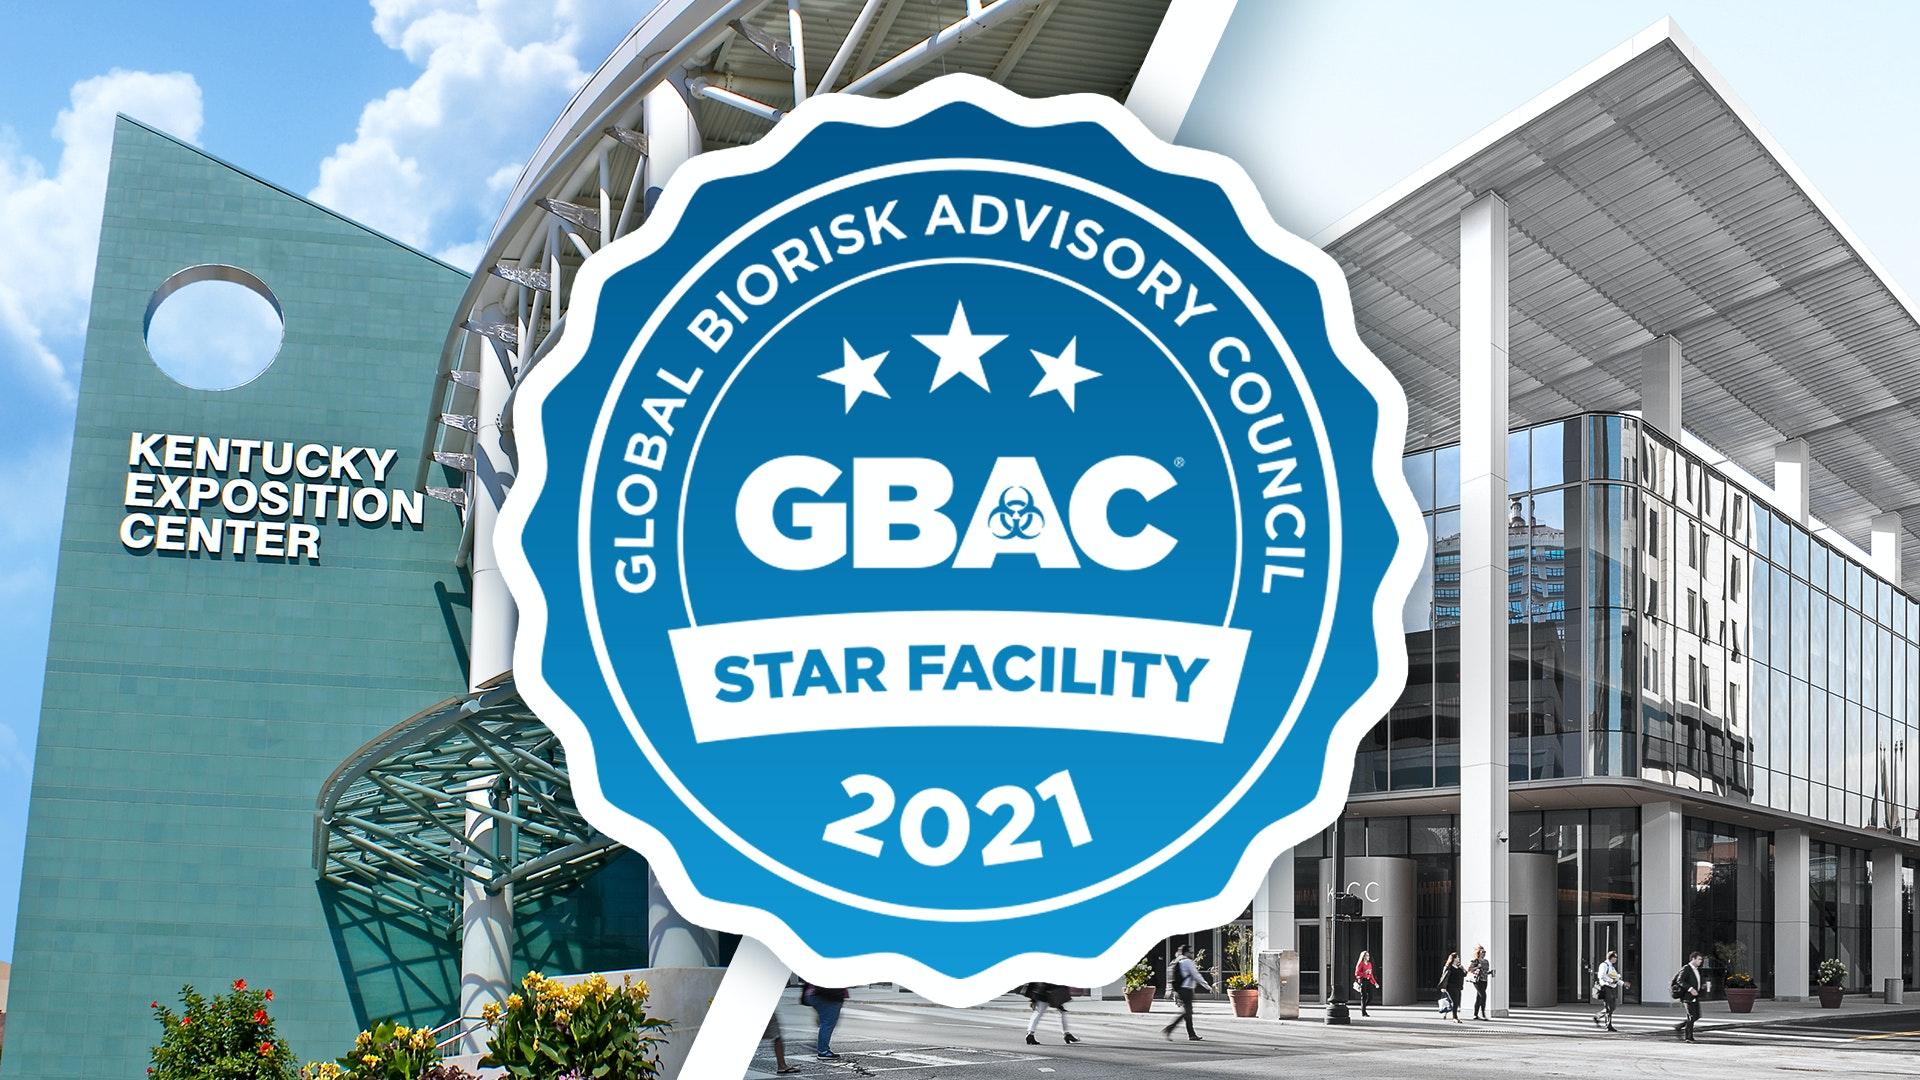 Venue Safe – Sanitization at the Kentucky Exposition Center and Kentucky International Convention Center